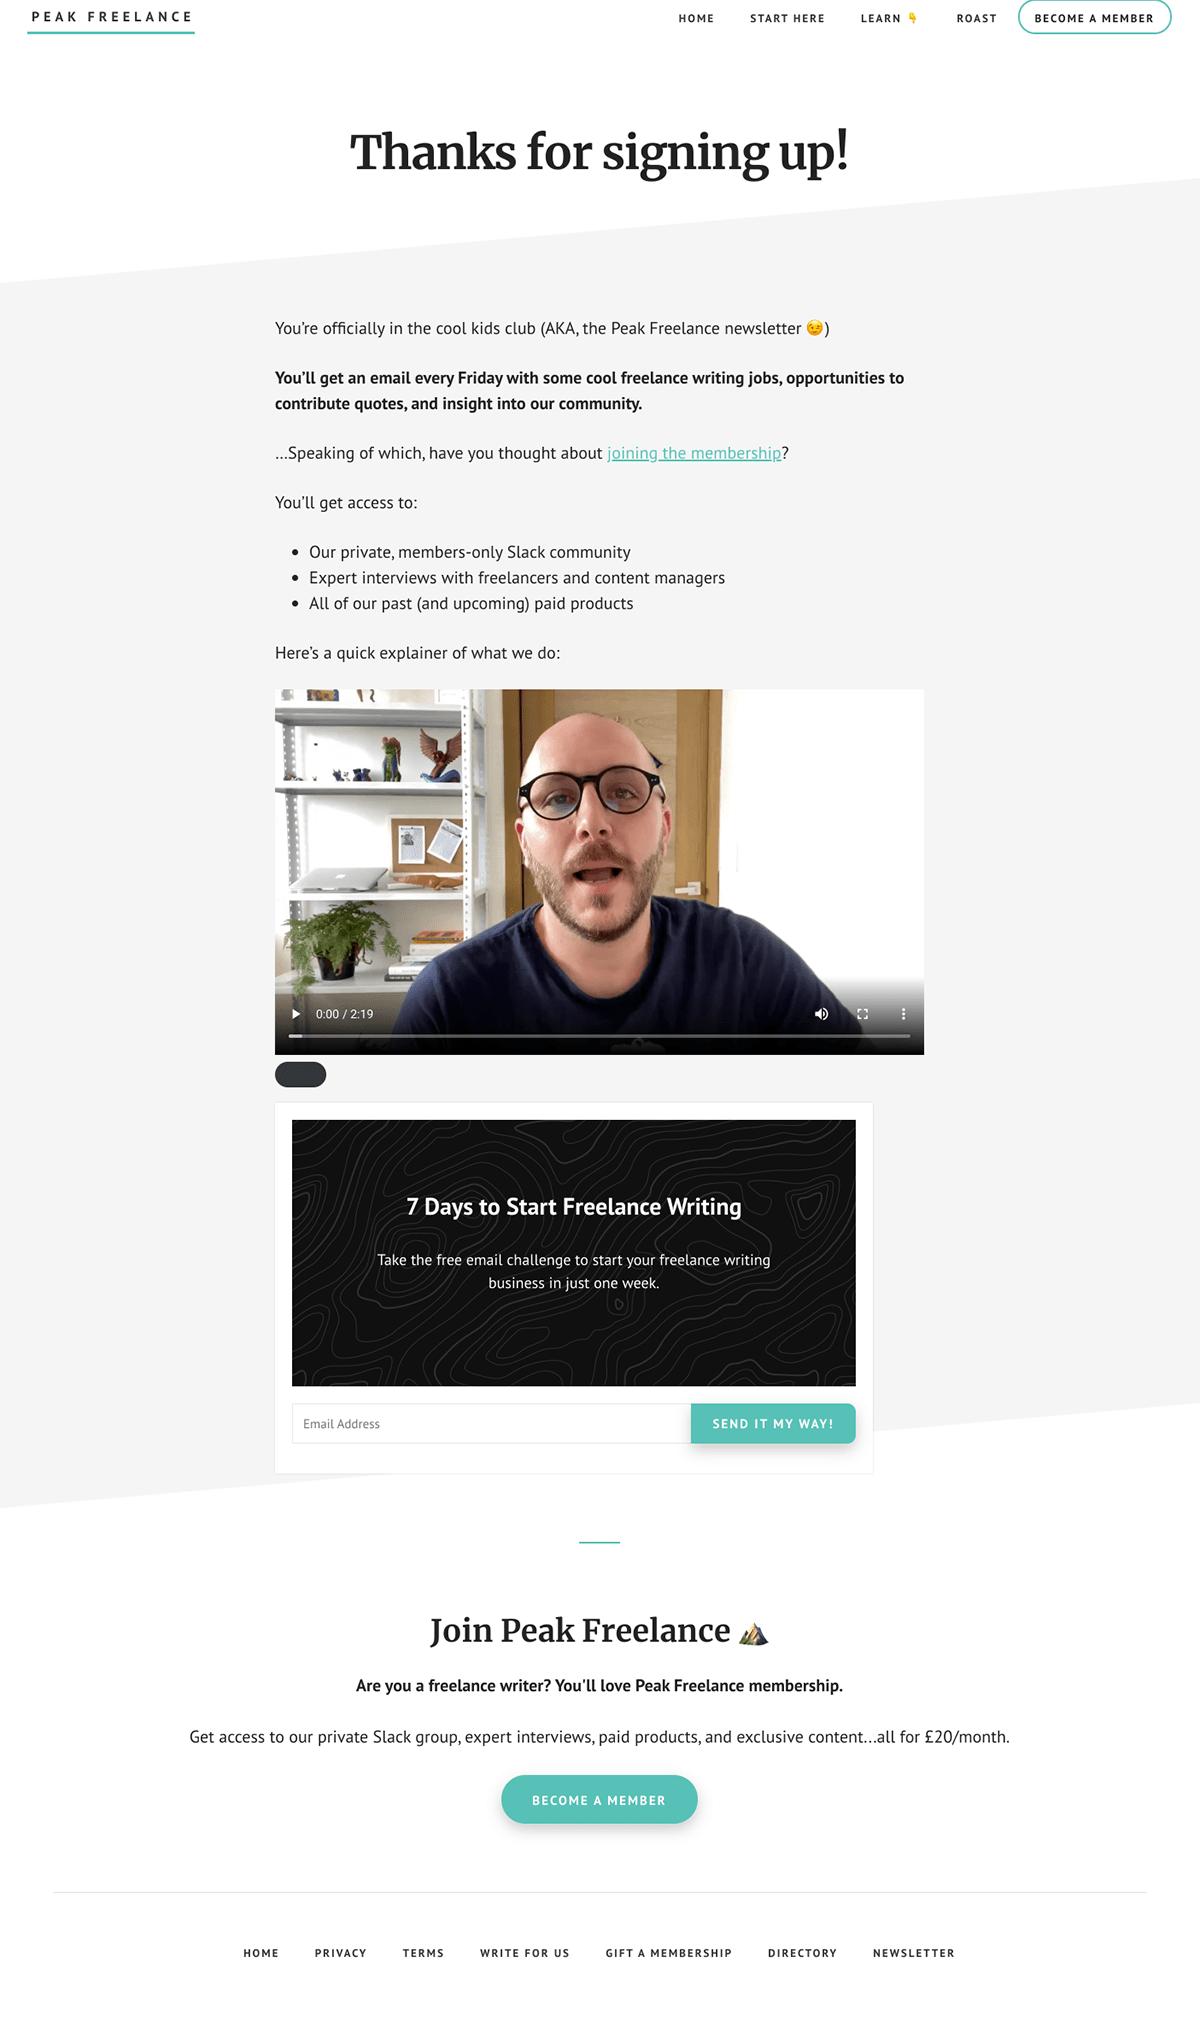 Peak Freelance Thank You Page Upsell